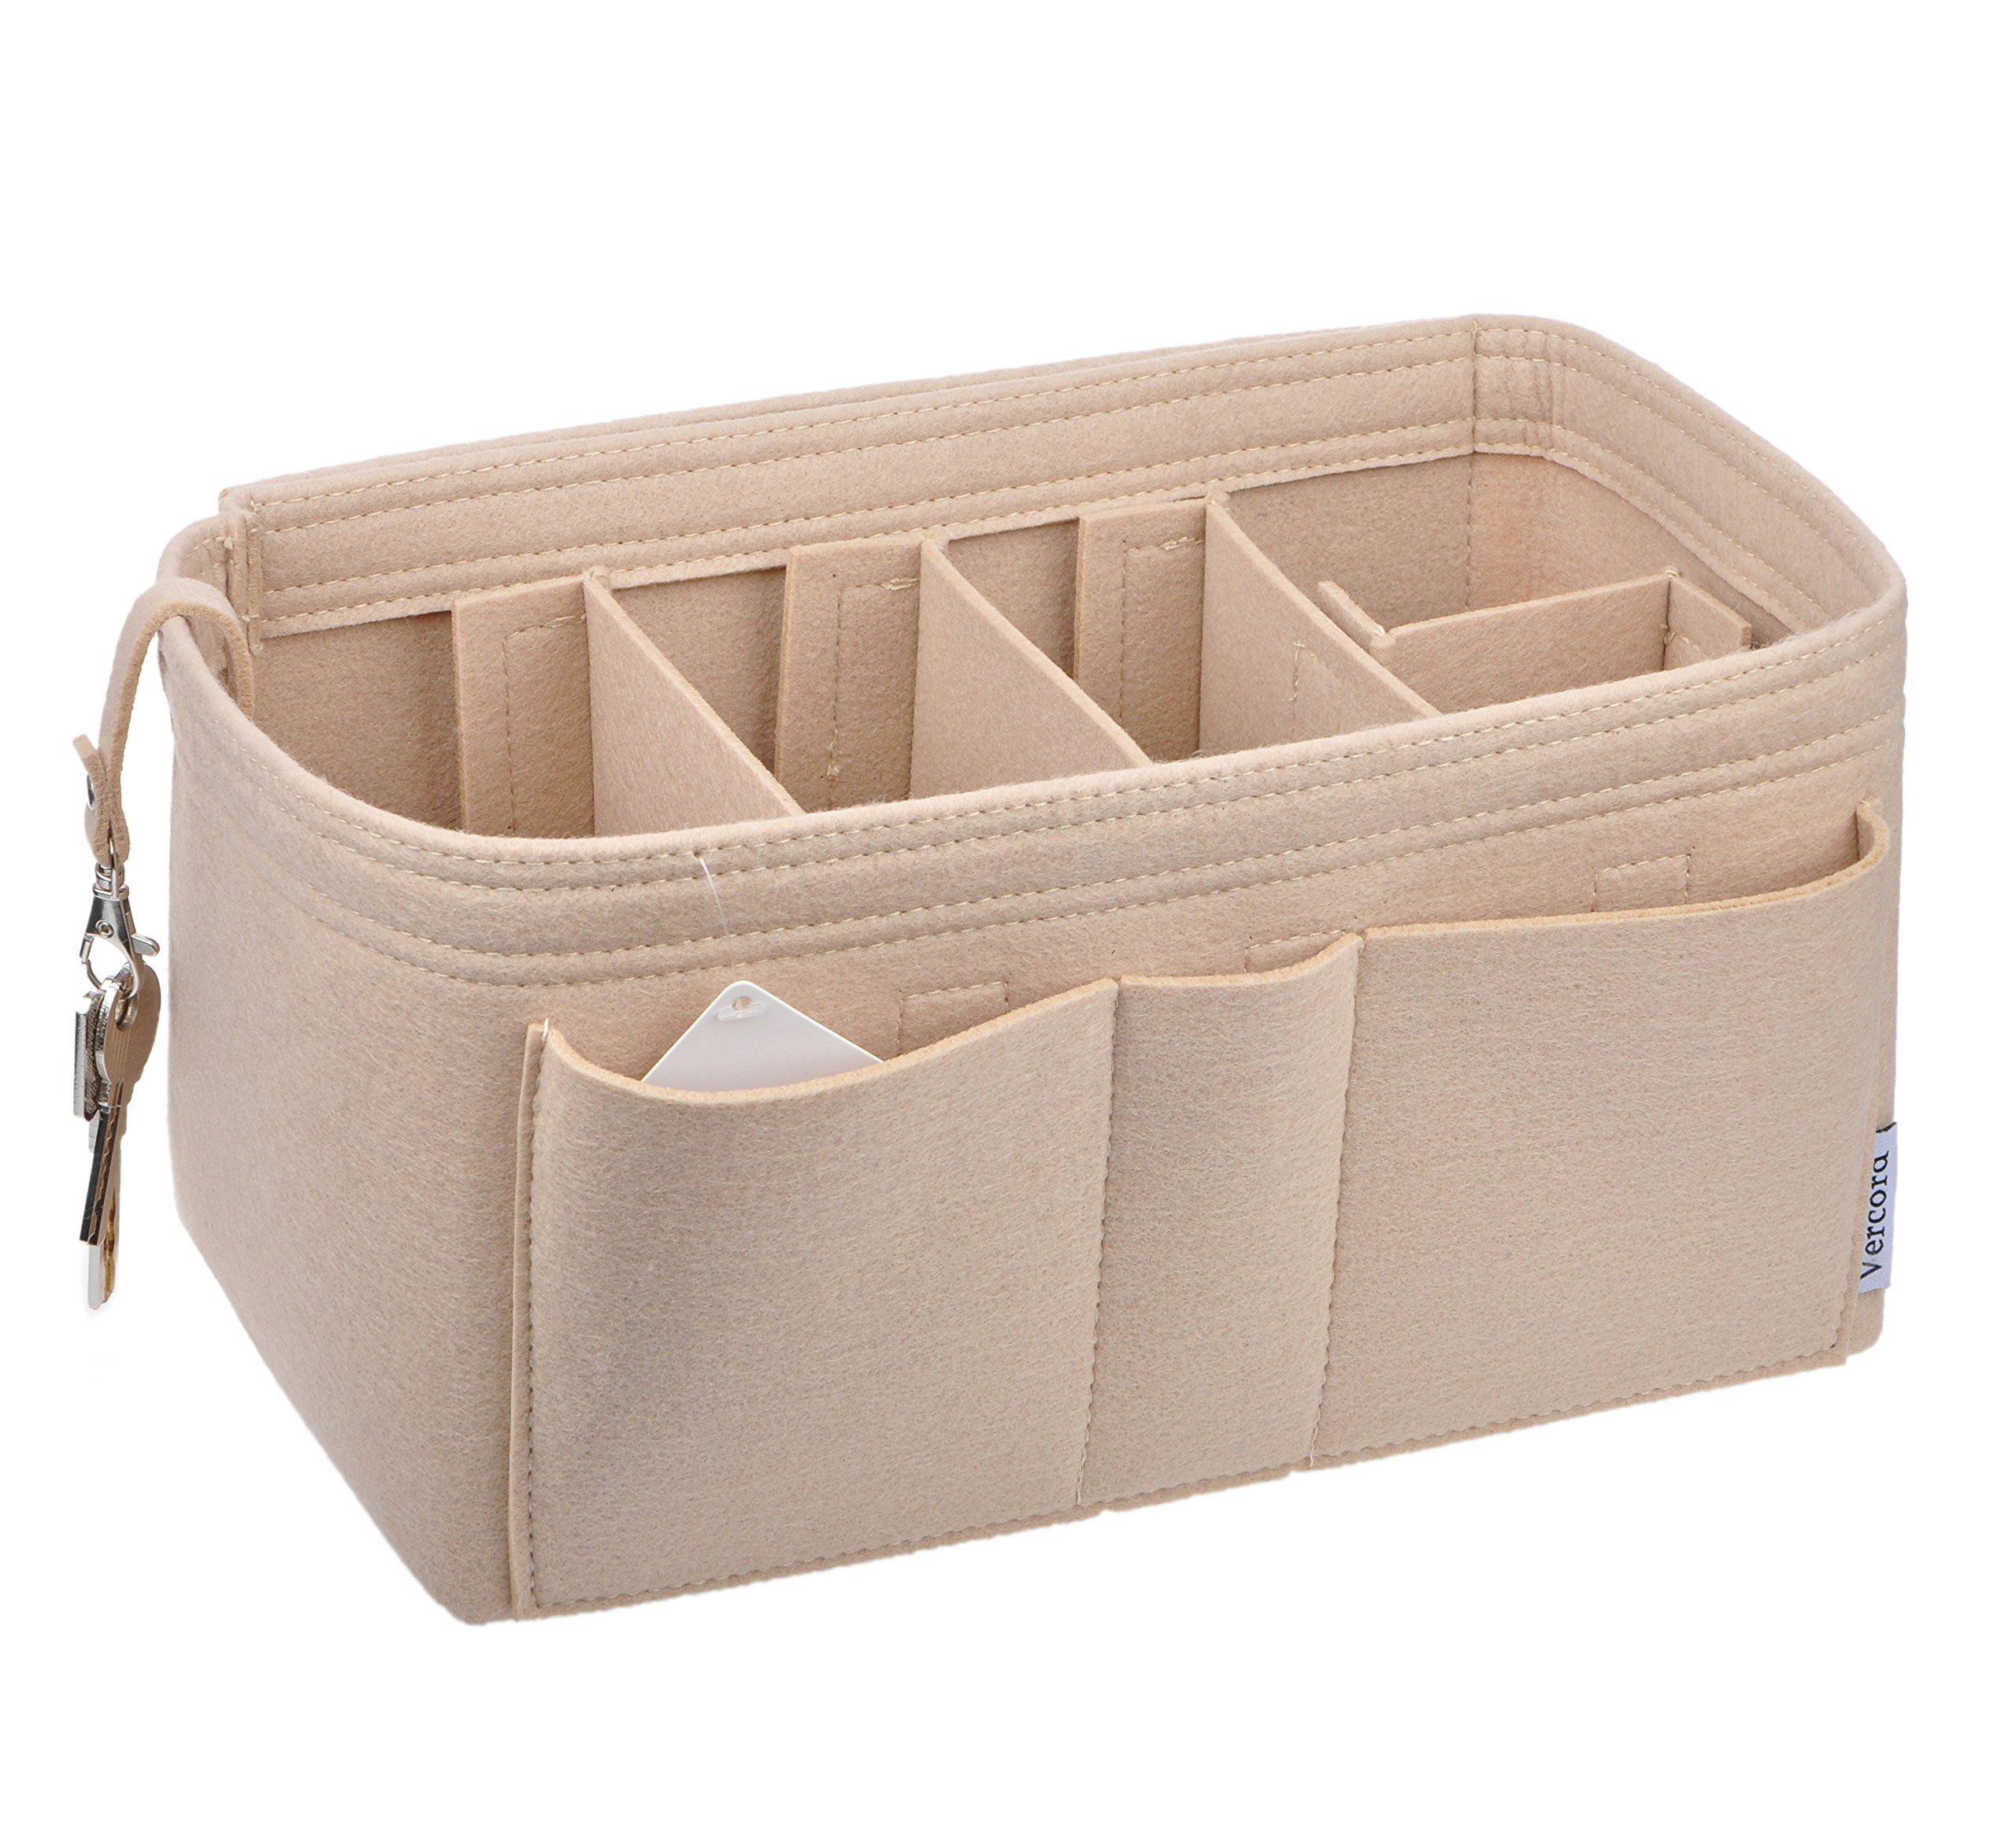 Vercord Felt Purse Handbag Organizer, Durable Insert Shaper 11 Pockets For Neverfull Speedy, Beige M